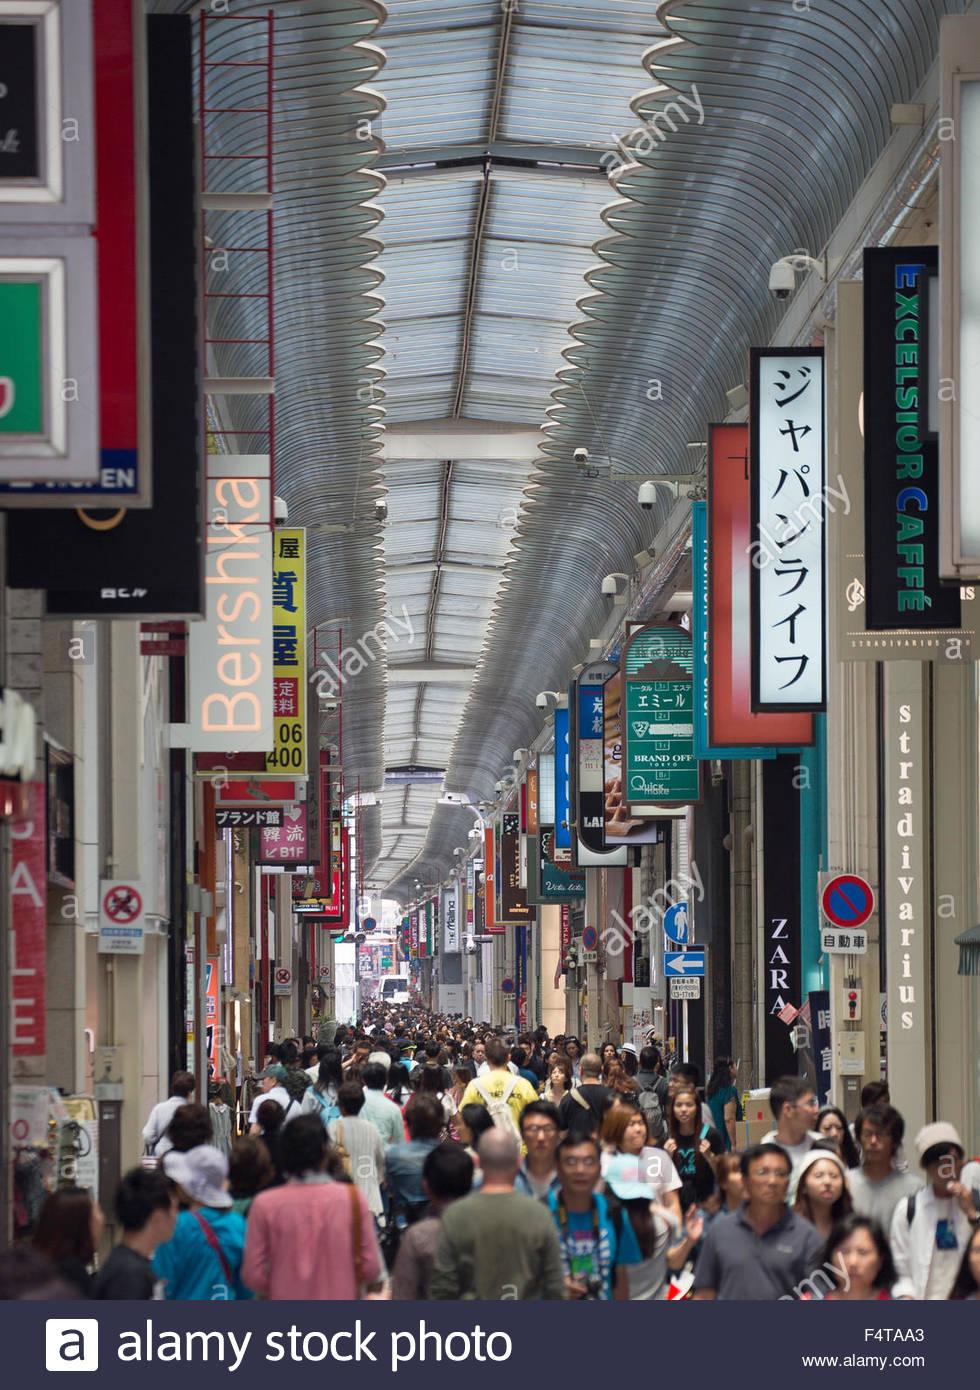 Japan, Osaka City, Dotombori Area, Shopping street - Stock Image